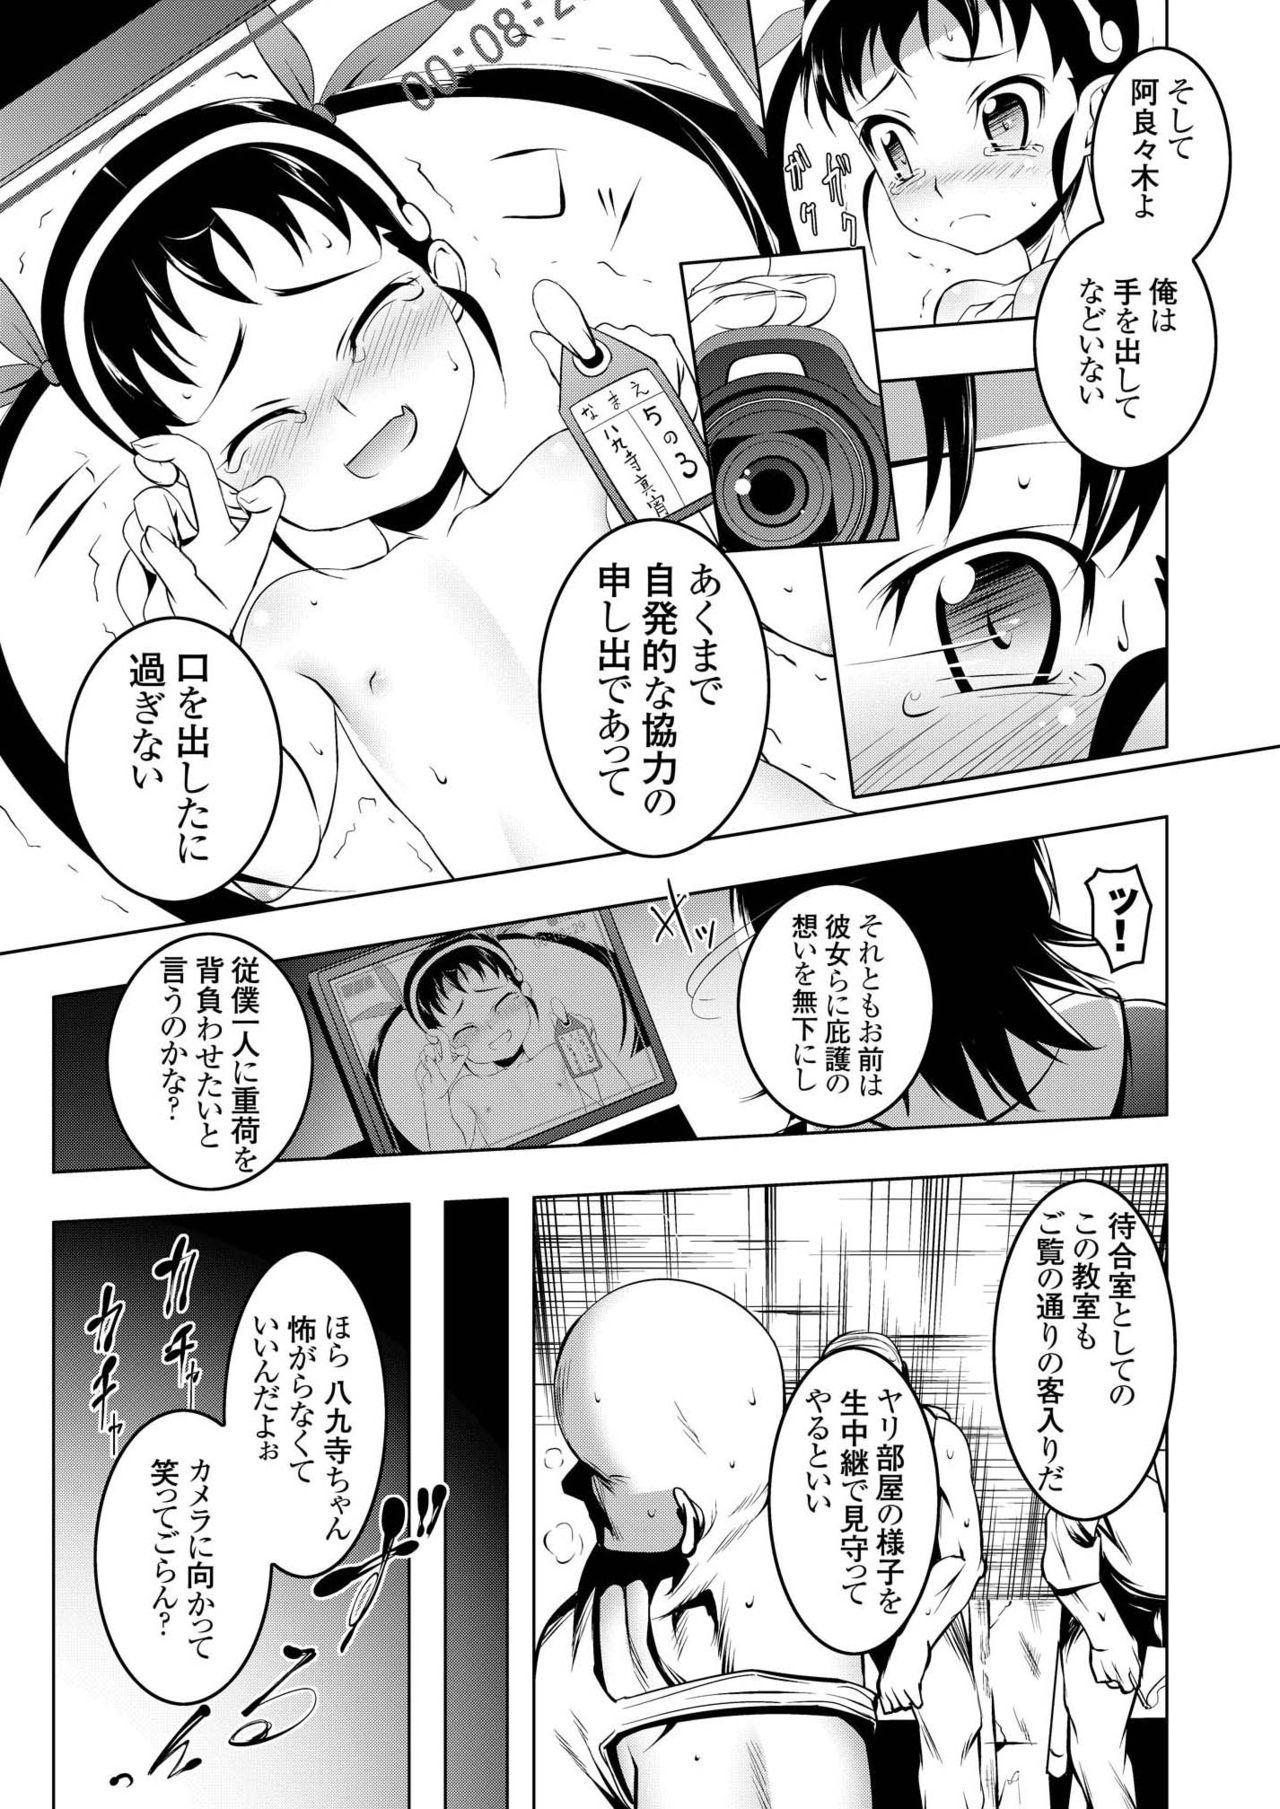 Netoraregatari Soushuuhen Ni 8